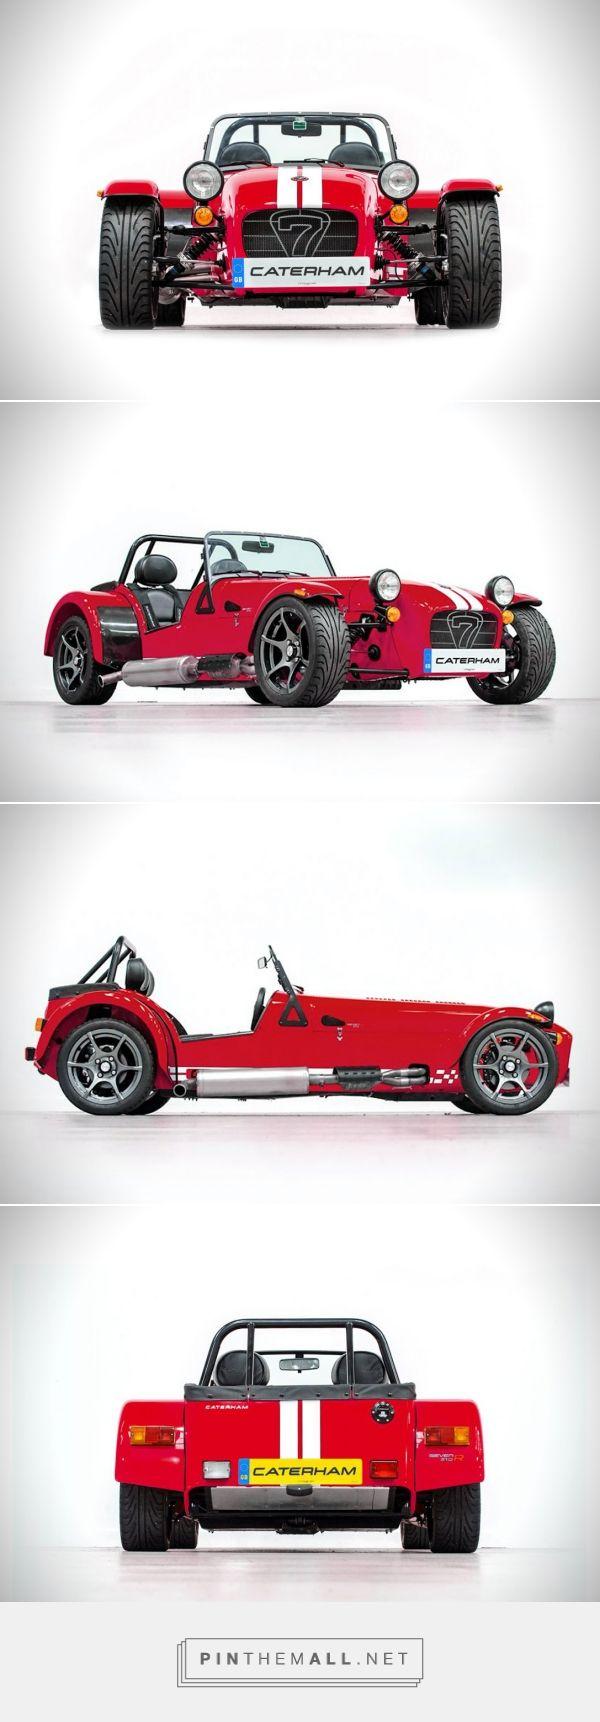 Caterham Seven 310 Sports Car | HiConsumption - created via https://pinthemall.net